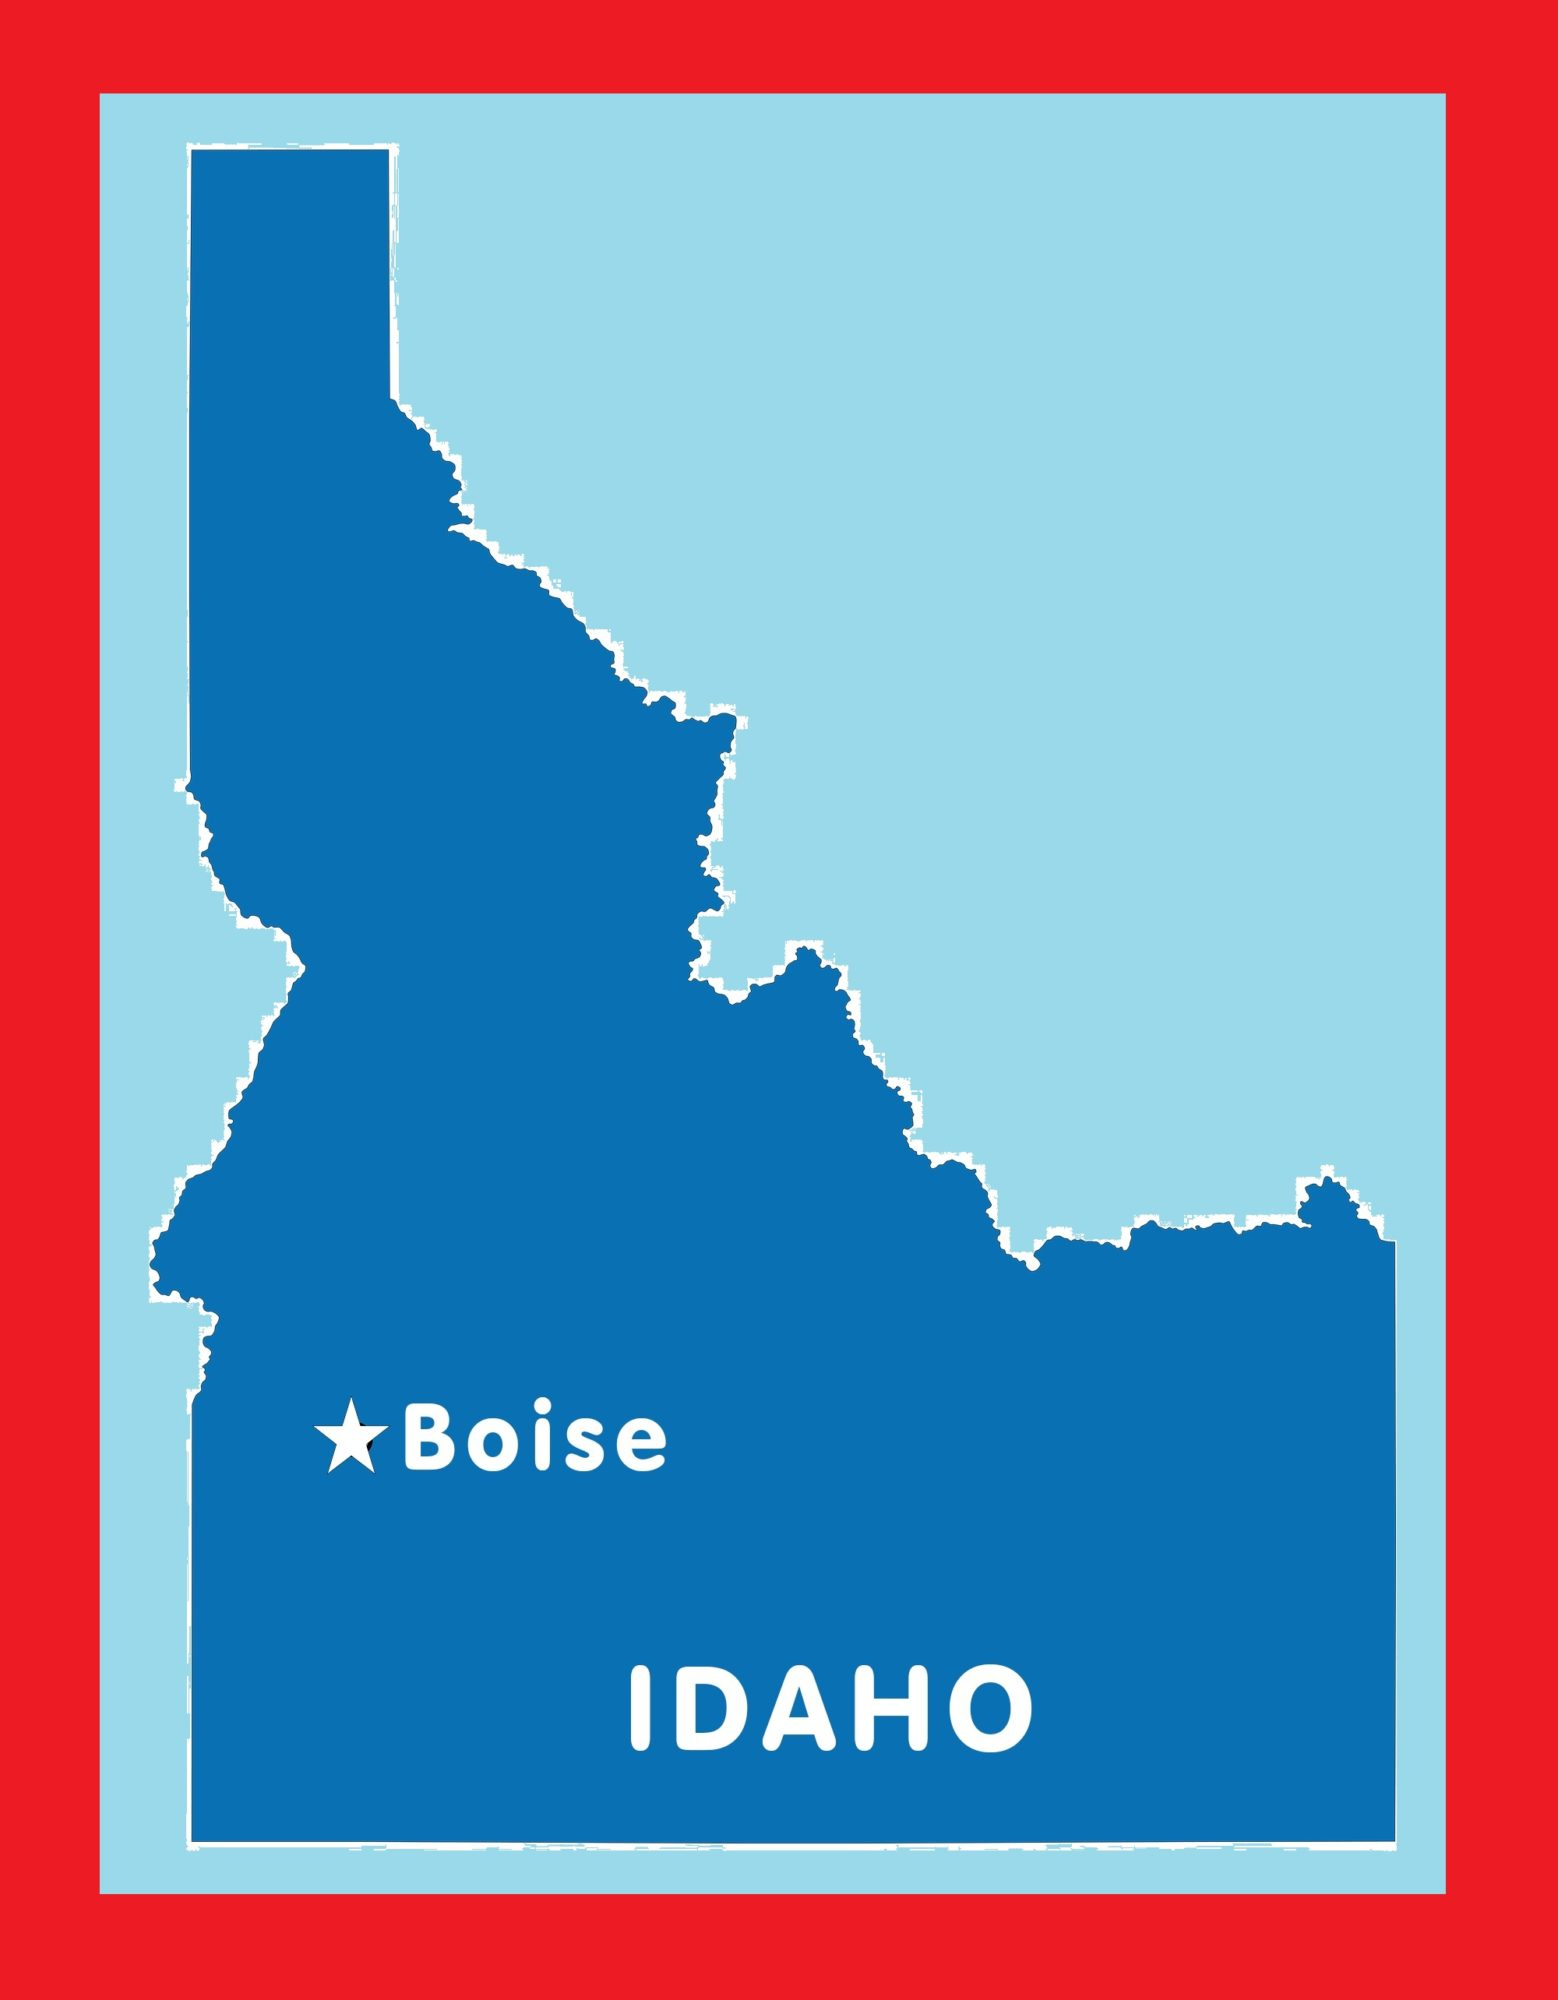 Idaho Capital Map | Large Printable and Standard Map 3